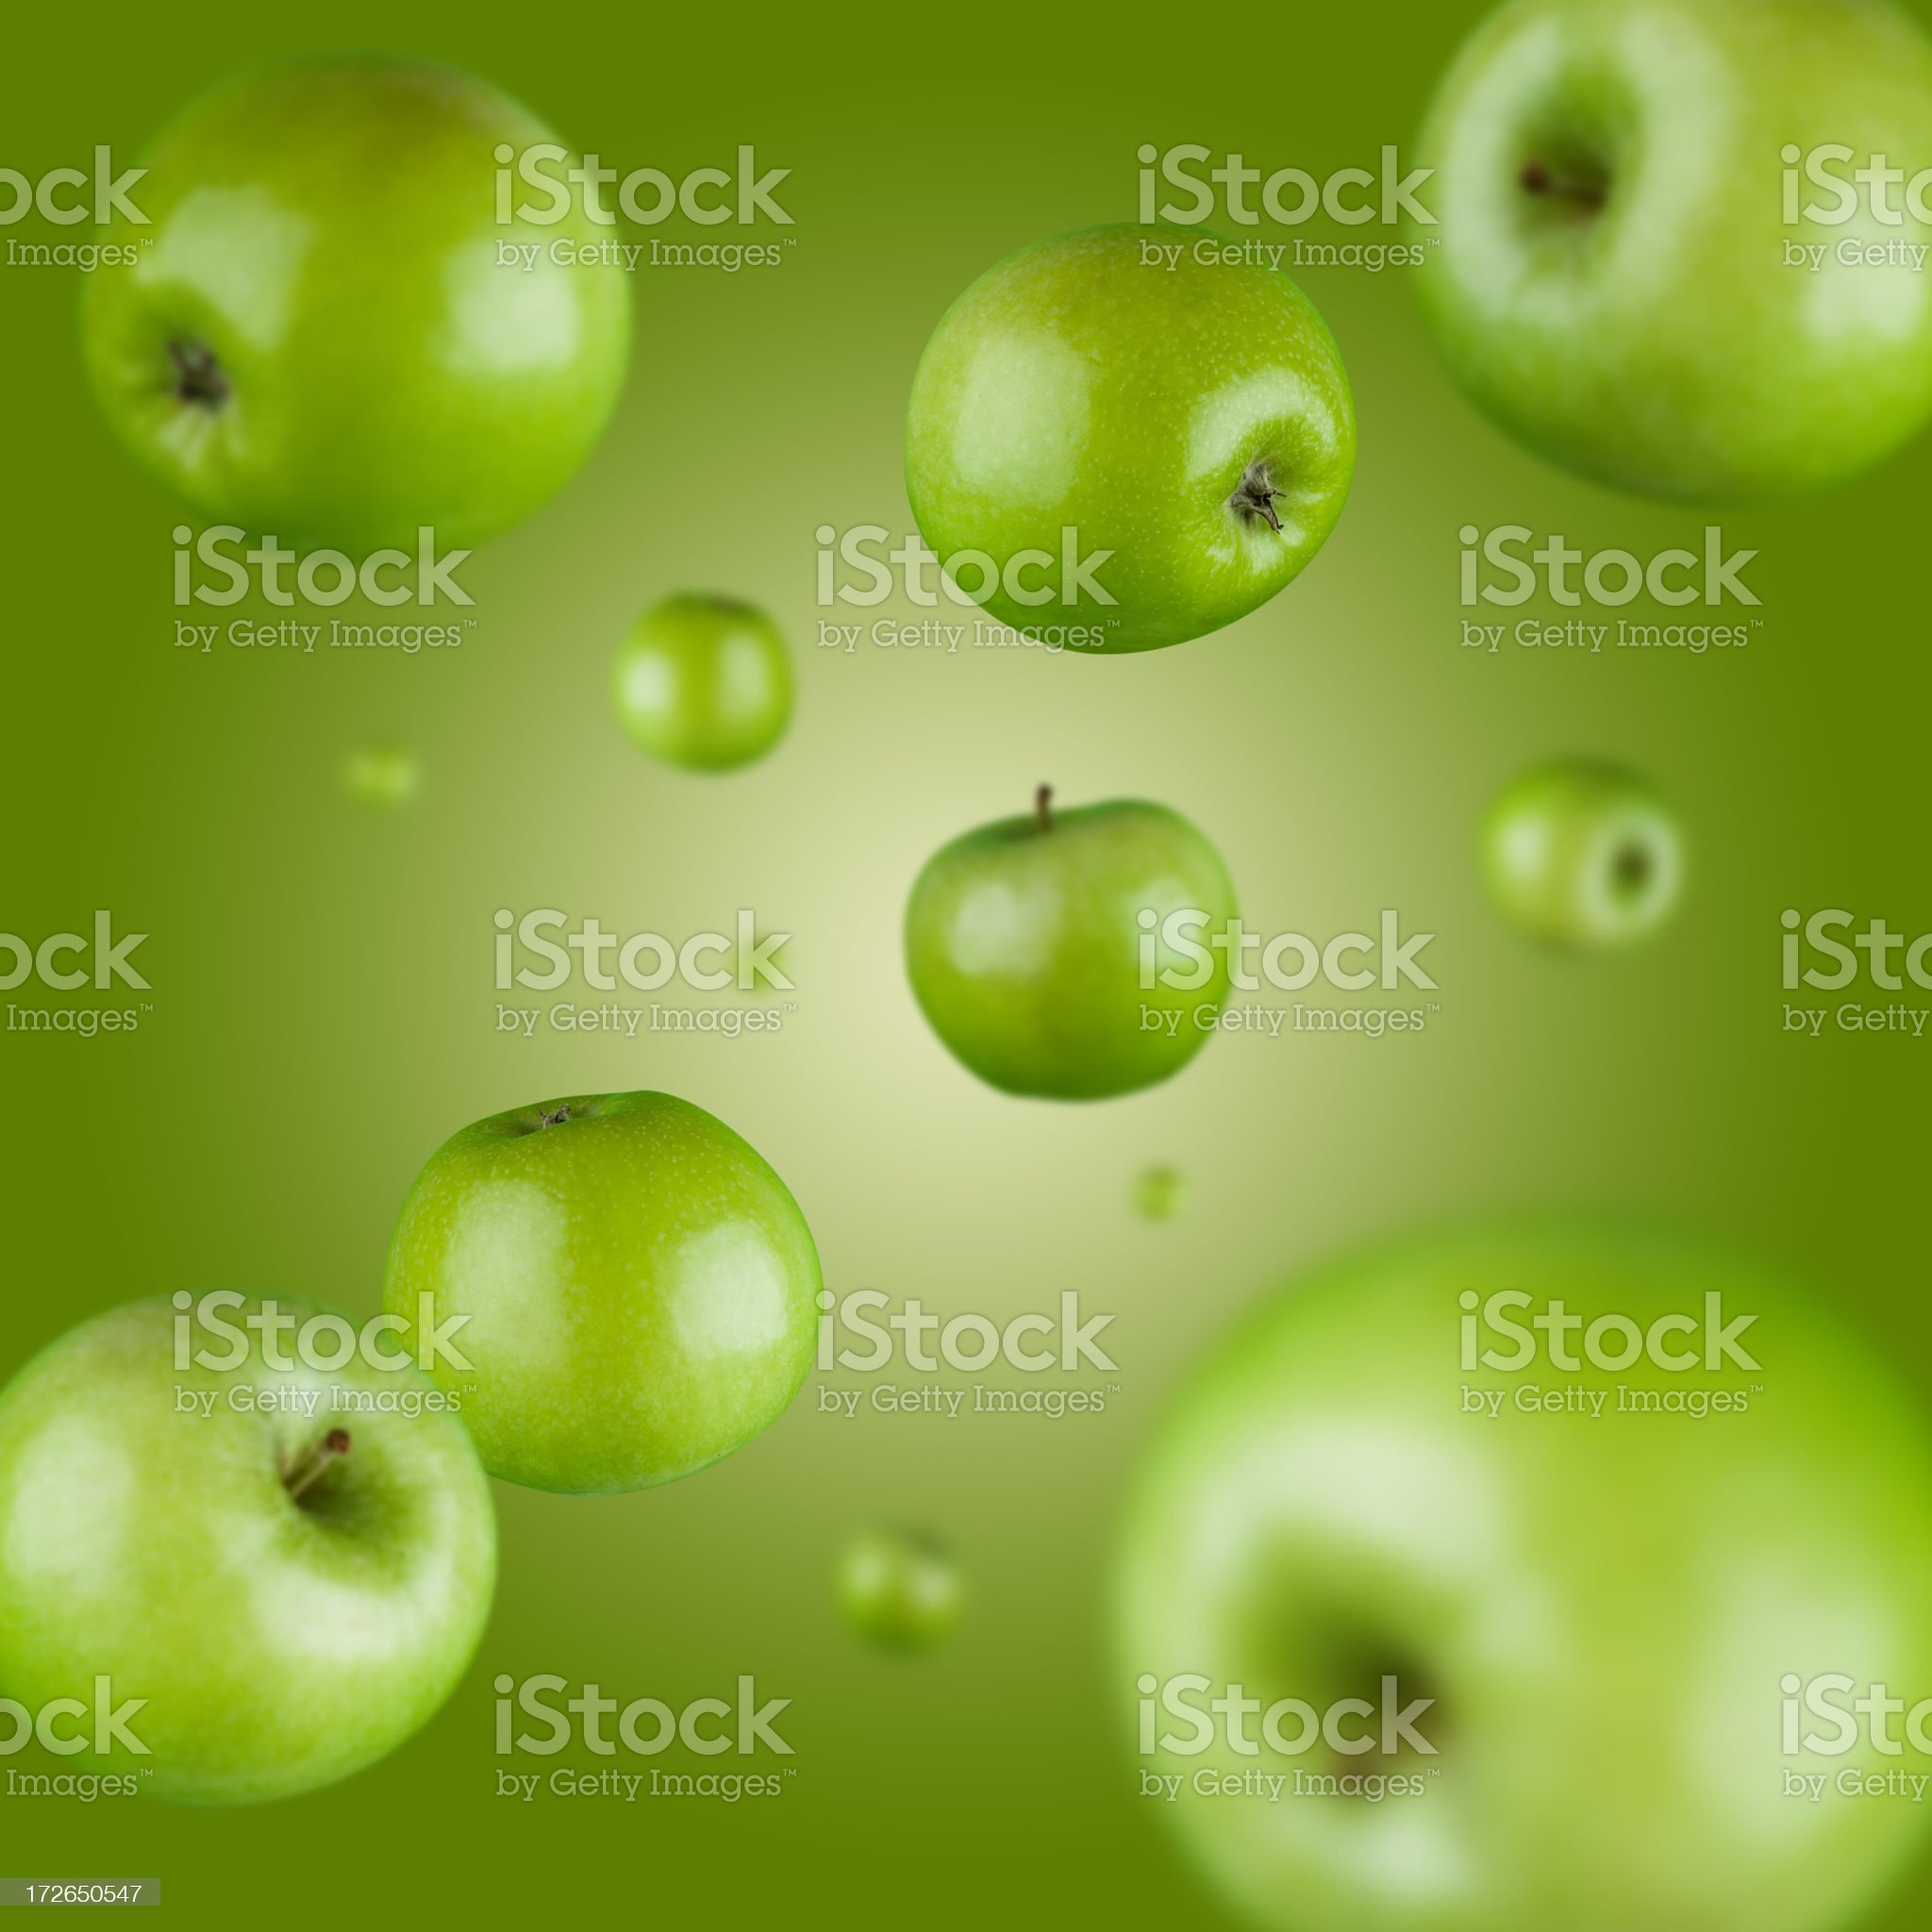 Green Apple Explosion royalty-free stock photo